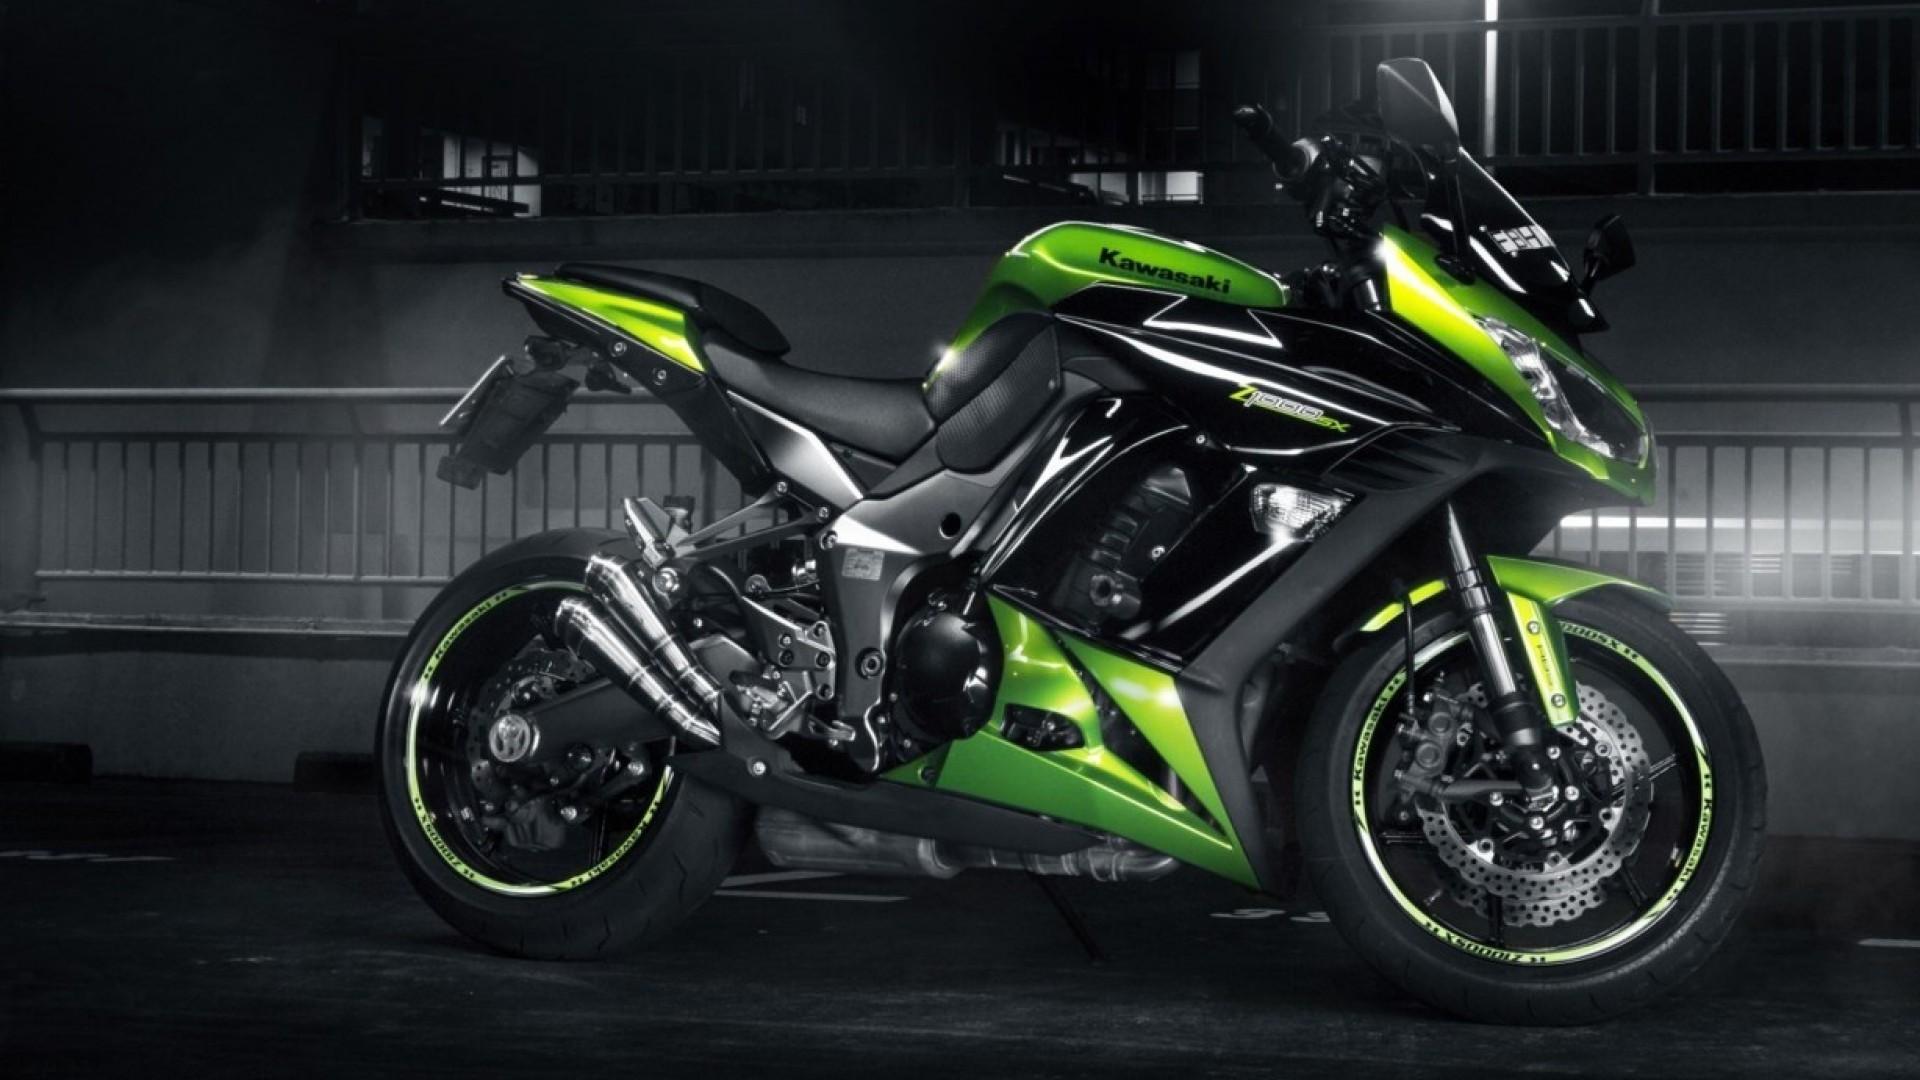 Cool Green Bike Wallpaper #6781825